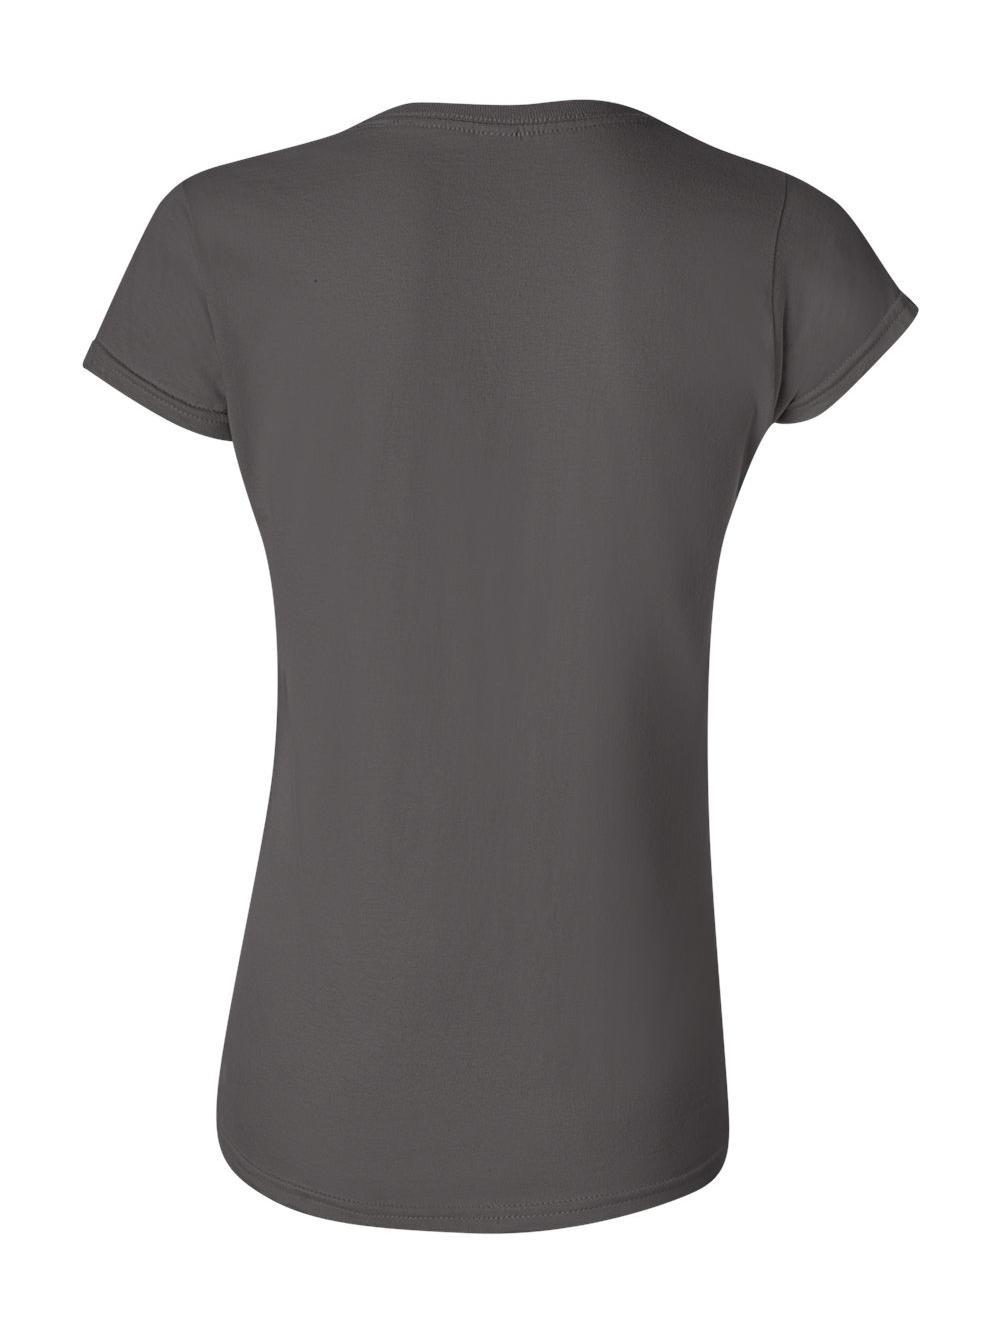 Gildan-Softstyle-Women-039-s-T-Shirt-64000L thumbnail 16